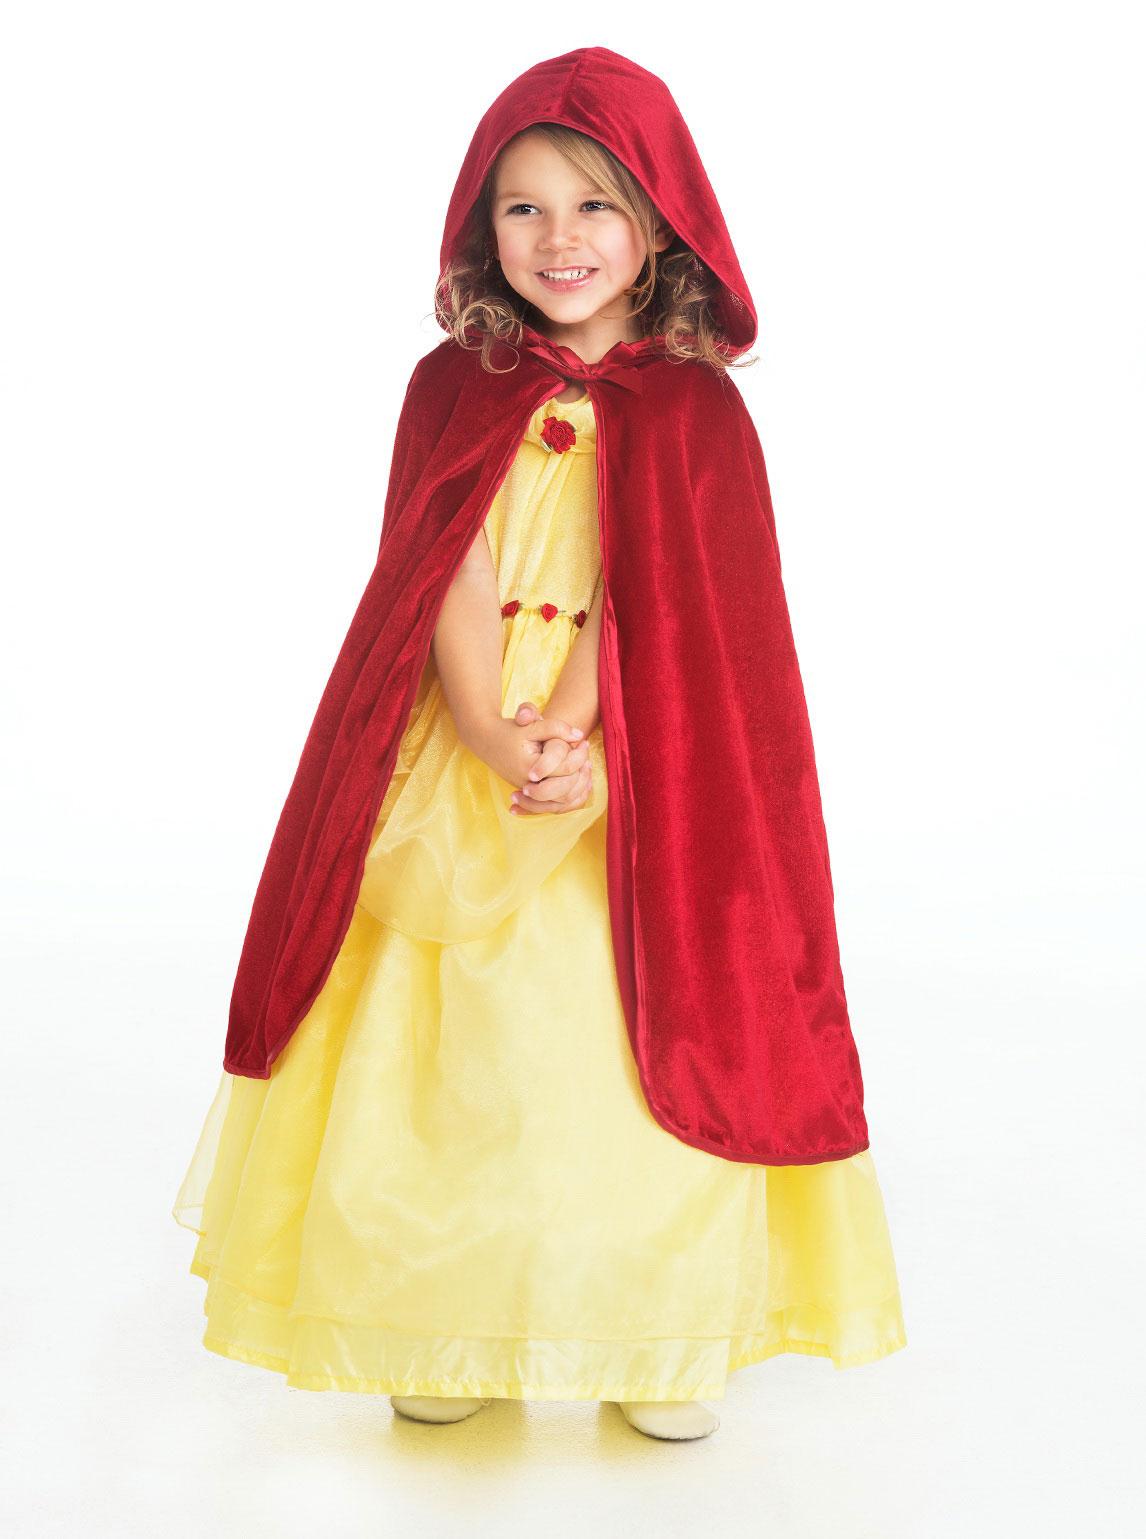 LA Girls Cloak Style Red Hooded Cloak Dress Up Capes Flow